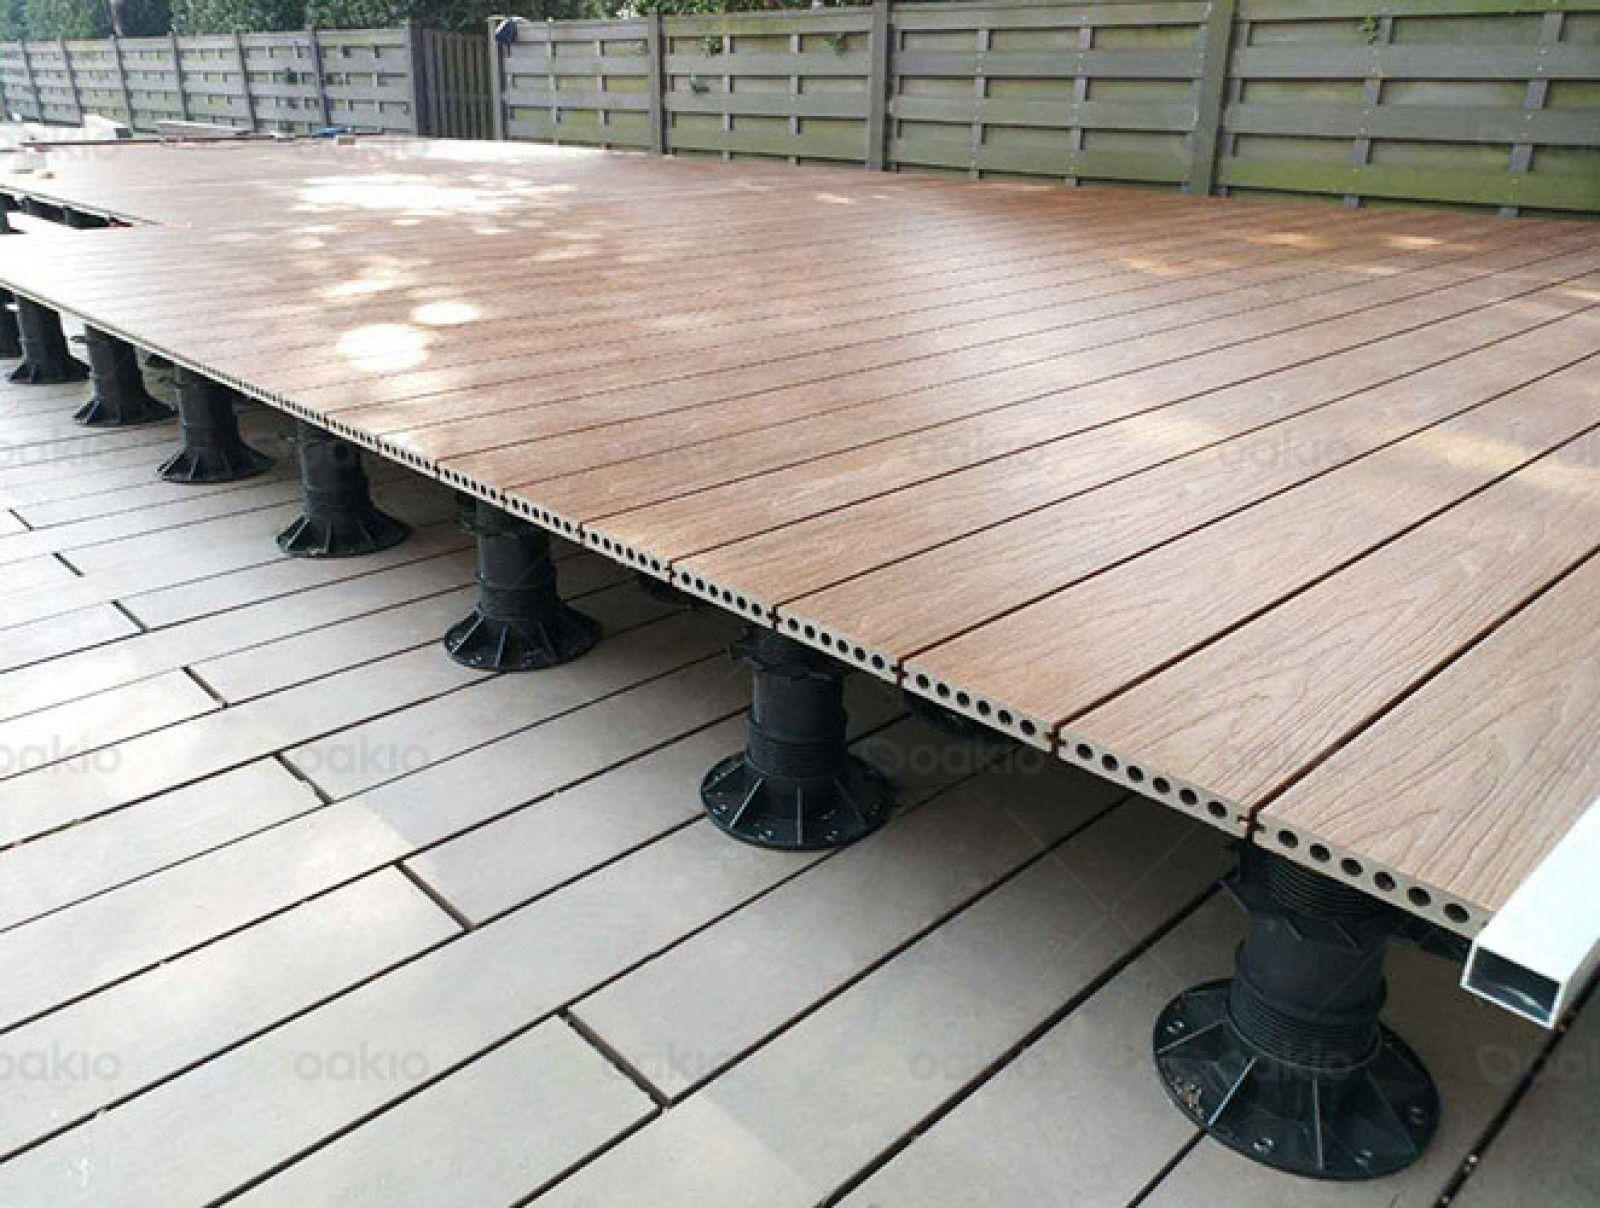 Pedestal In 2020 Wood Deck Deck Tiles Membrane Roof